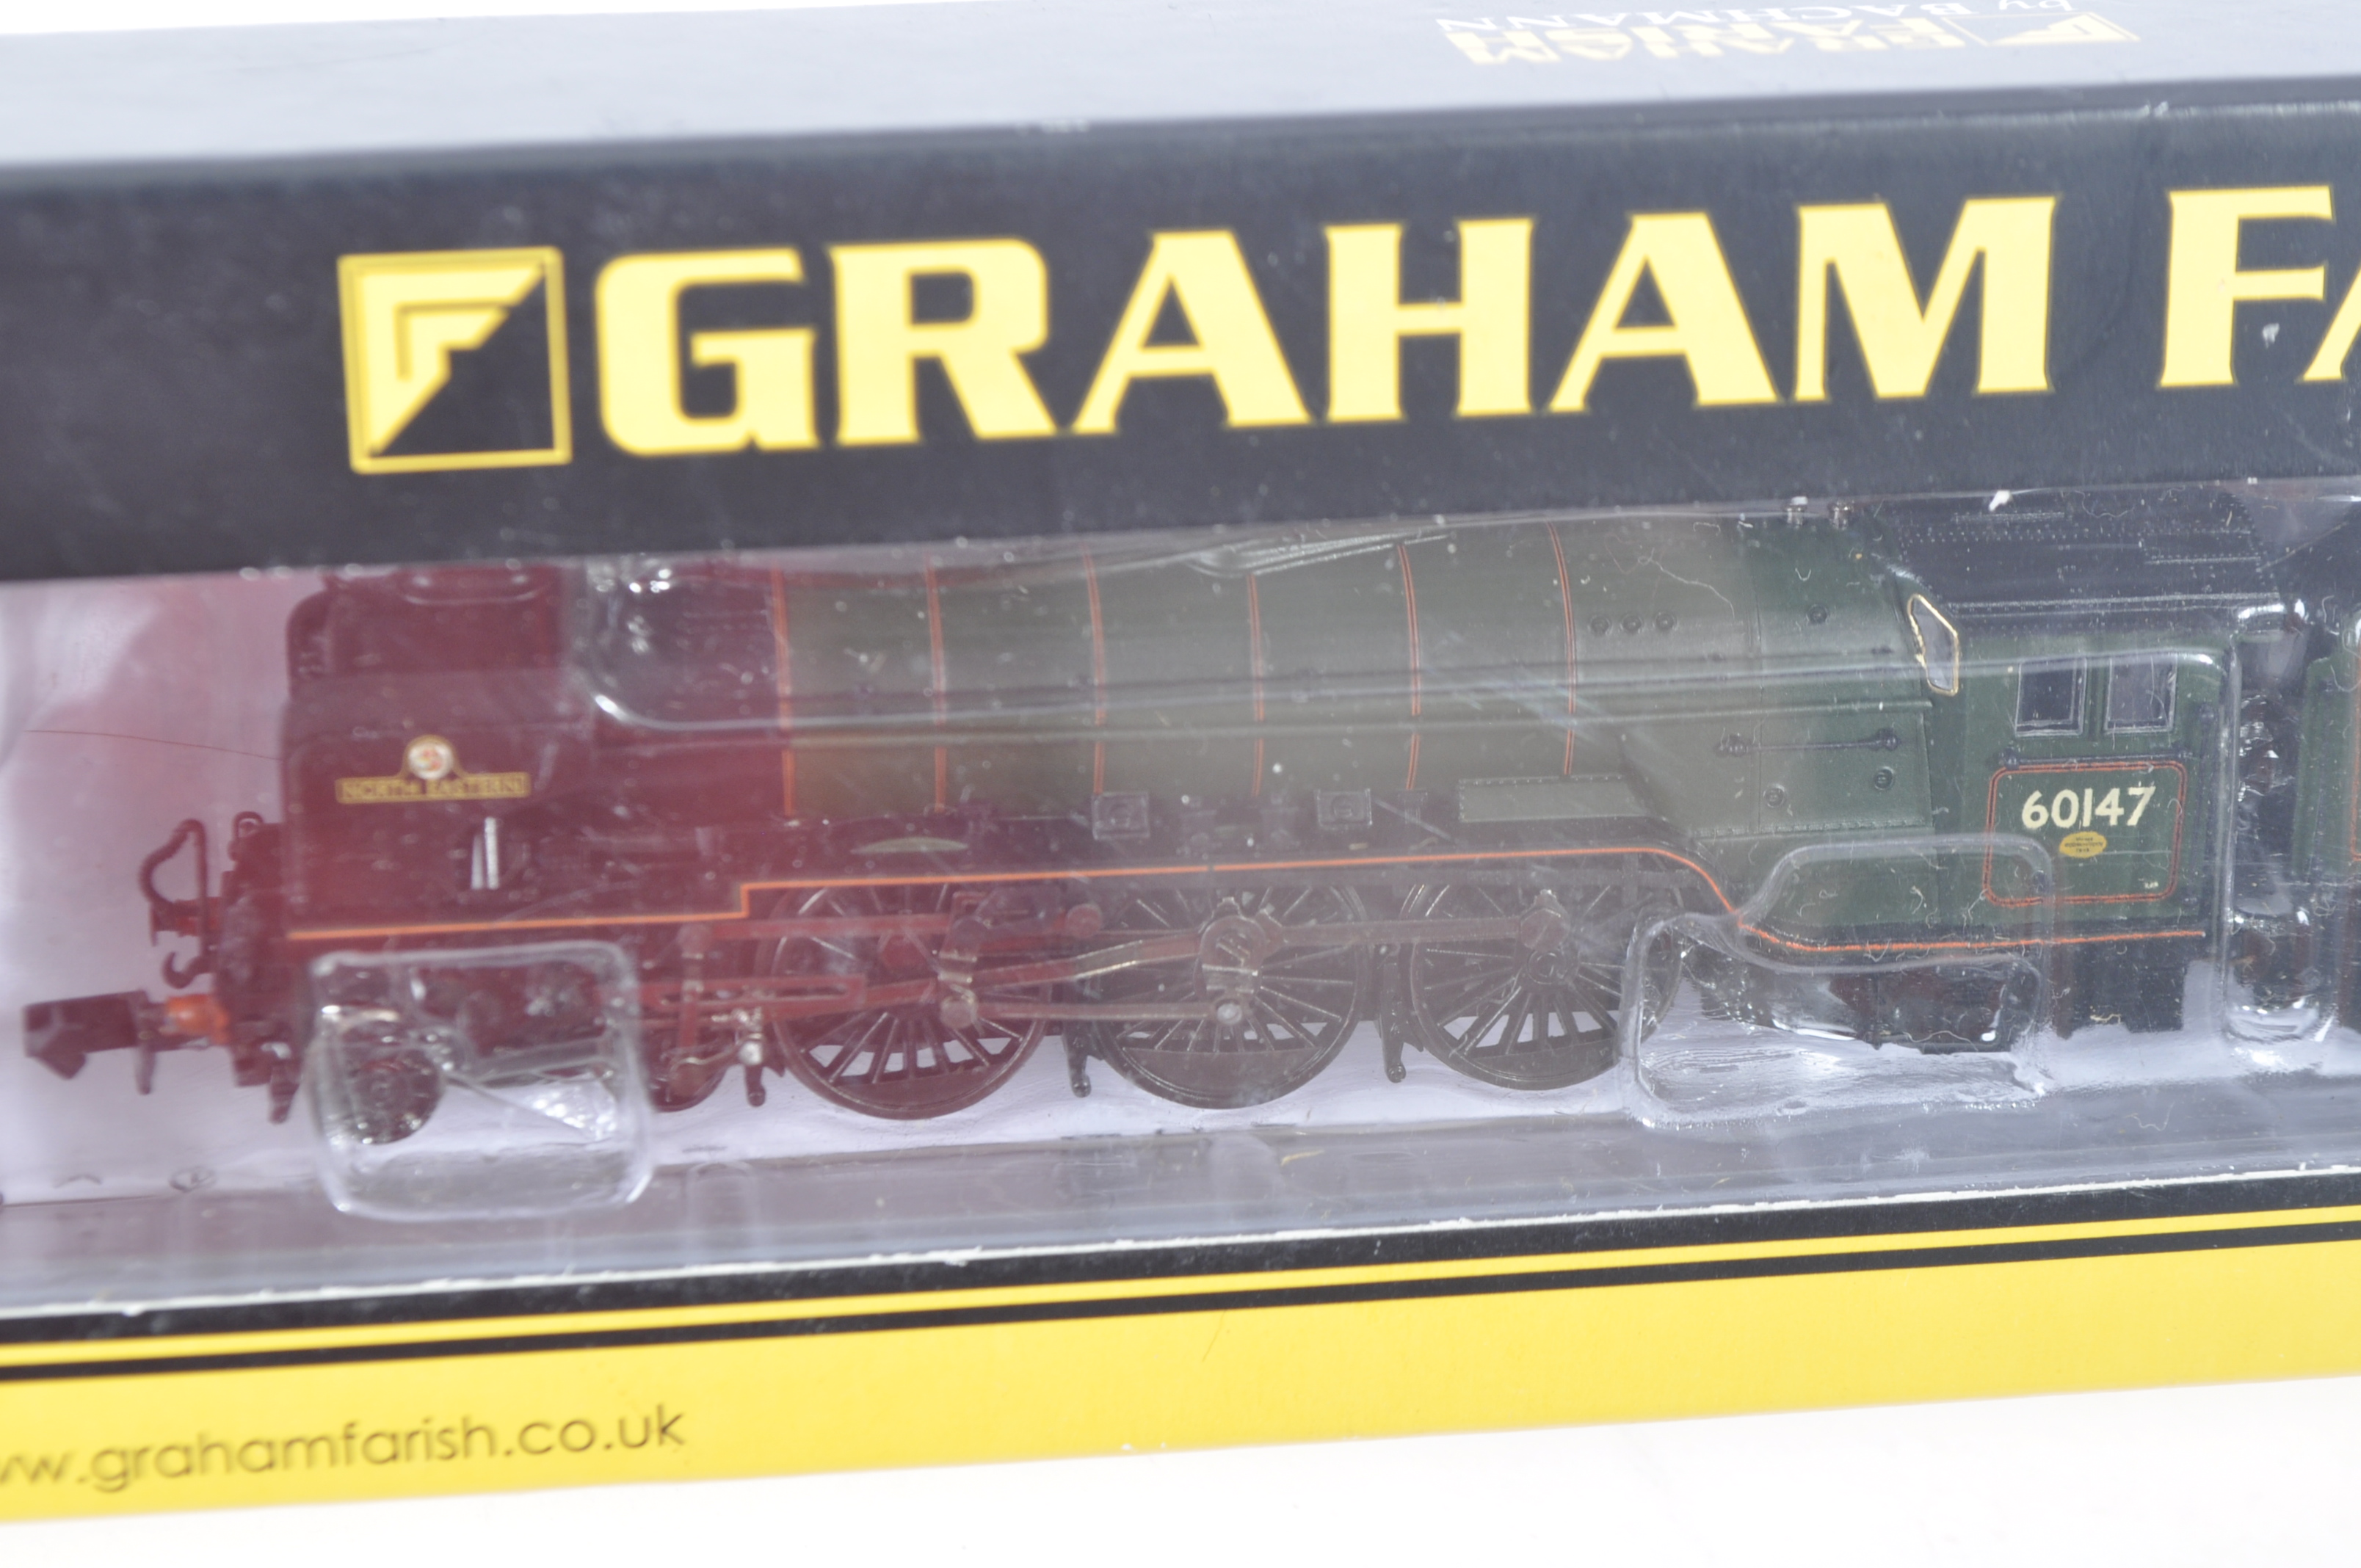 ORIGINAL GRAHAM FARISH N GAUGE MODEL RAILWAY LOCOMOTIVE - Image 2 of 4